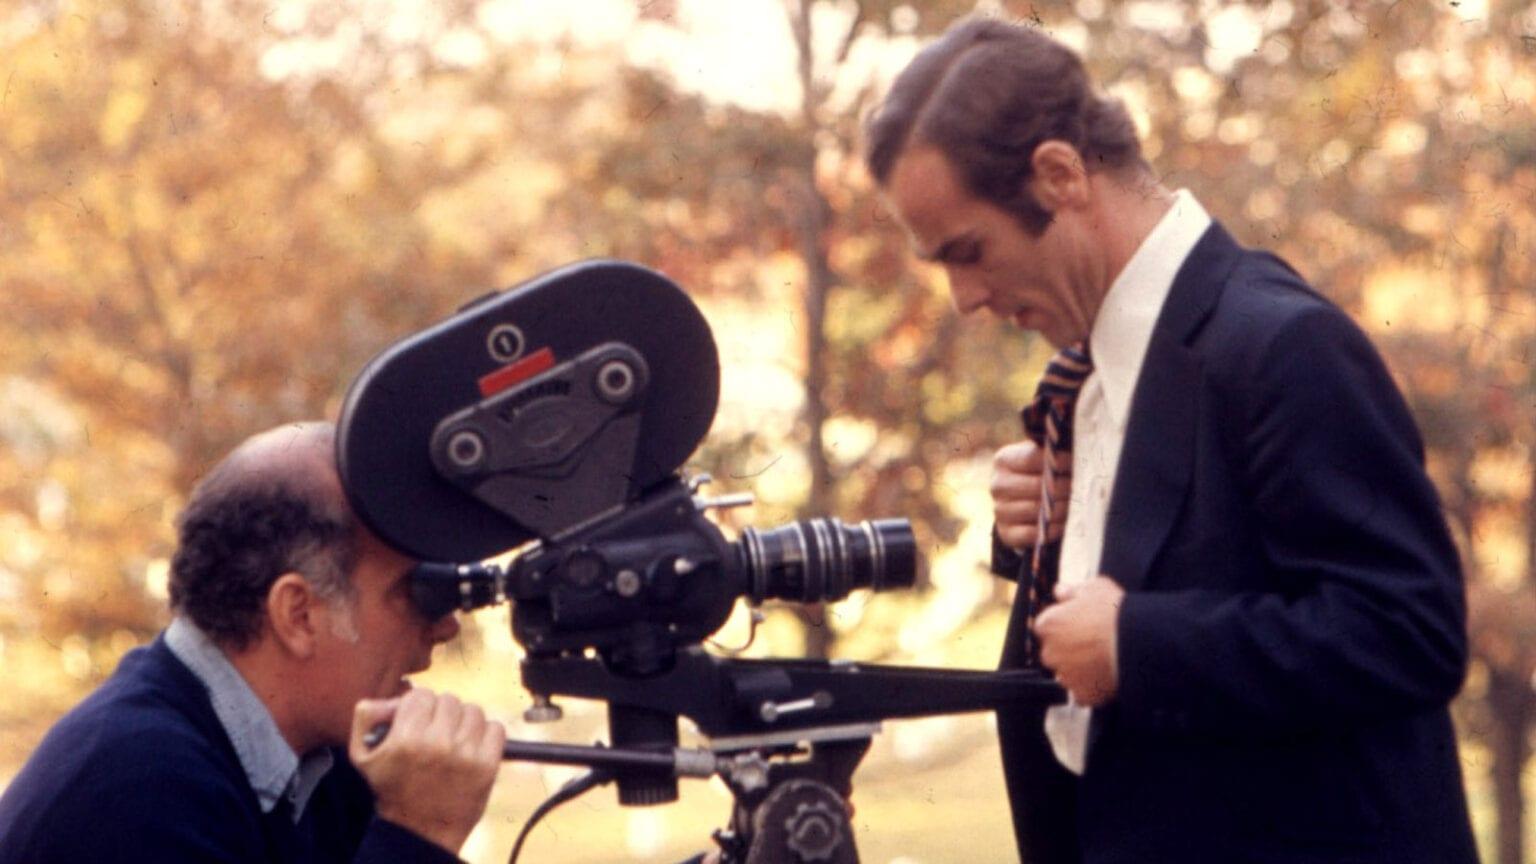 Ginsberg directing Stockwell